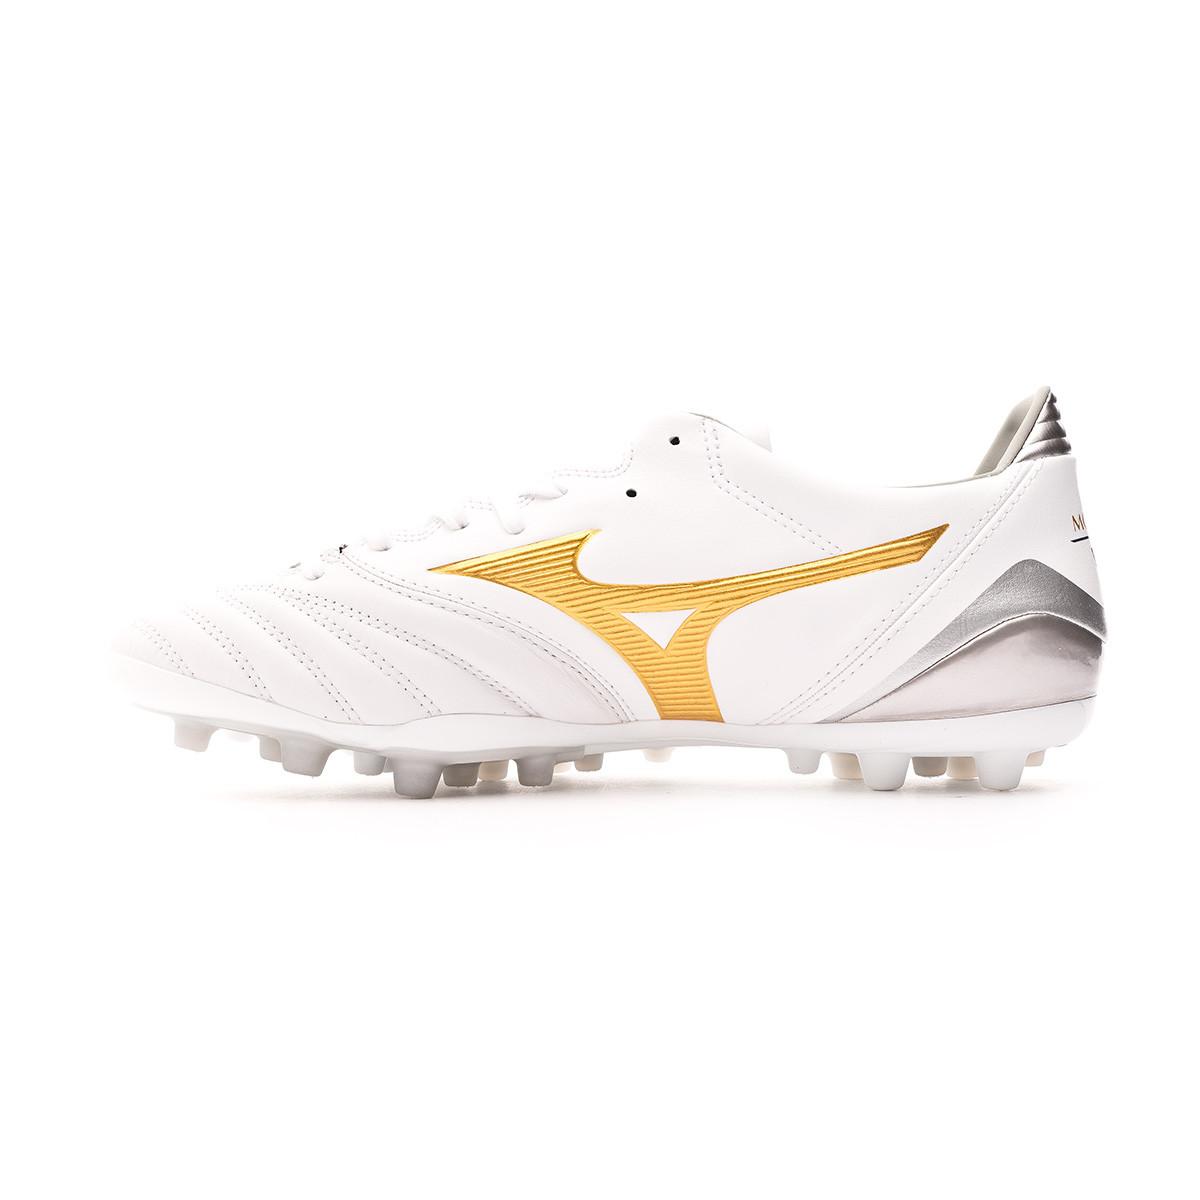 Chaussure de foot Mizuno Morelia Neo II KL AG